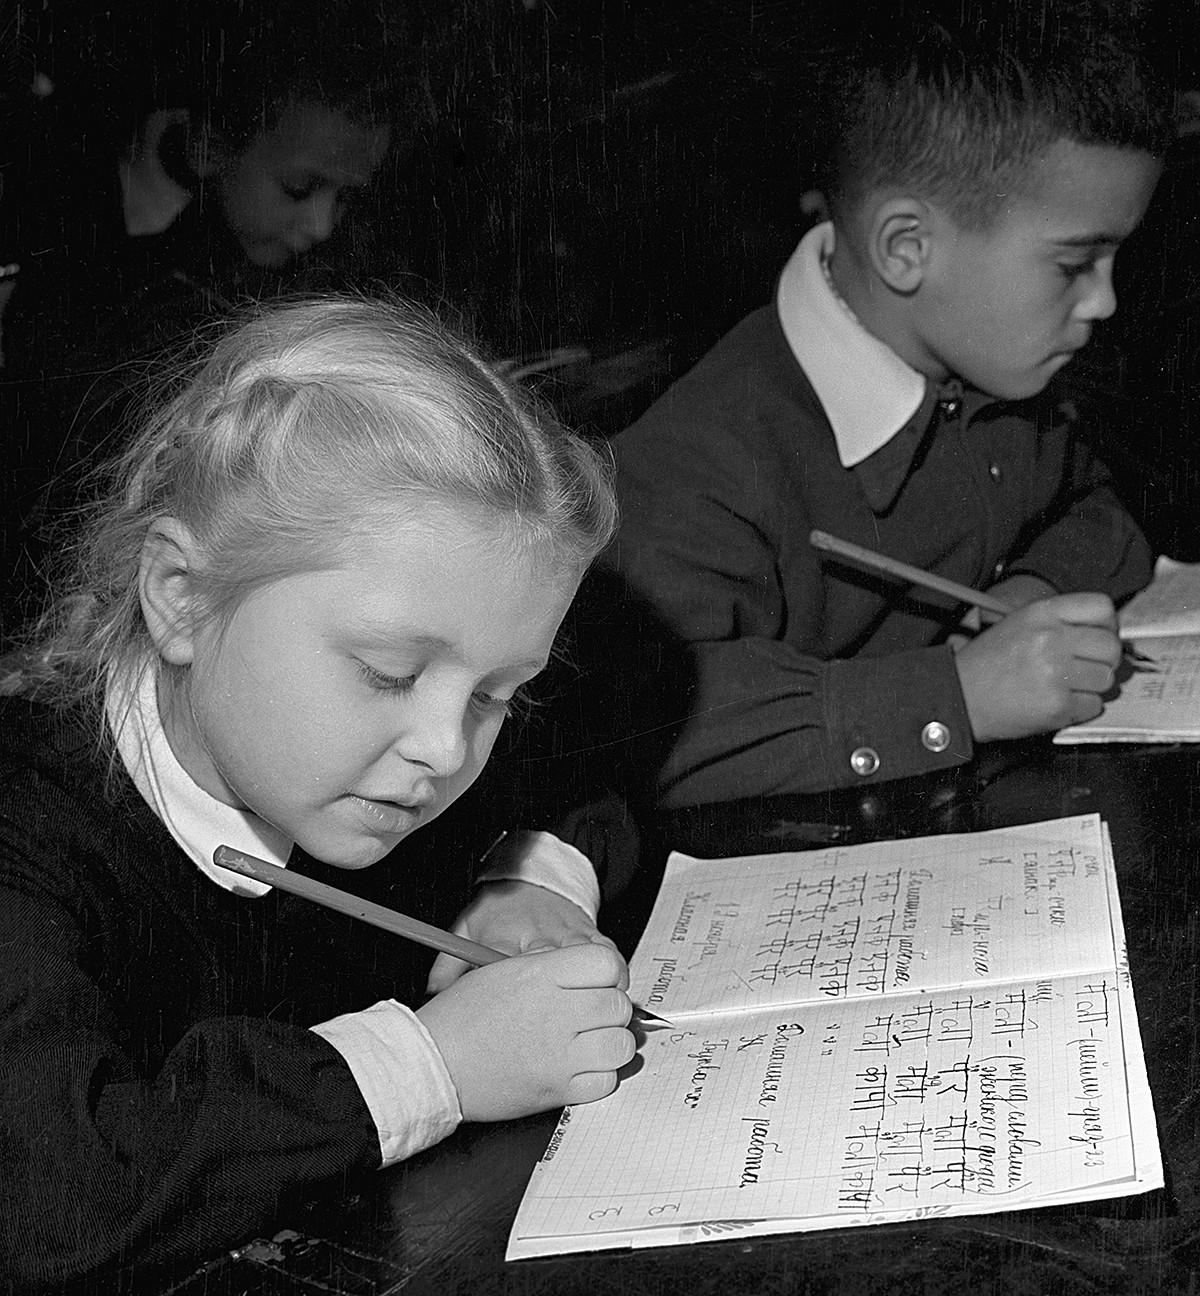 Ученици по време на урок, 1959 г.